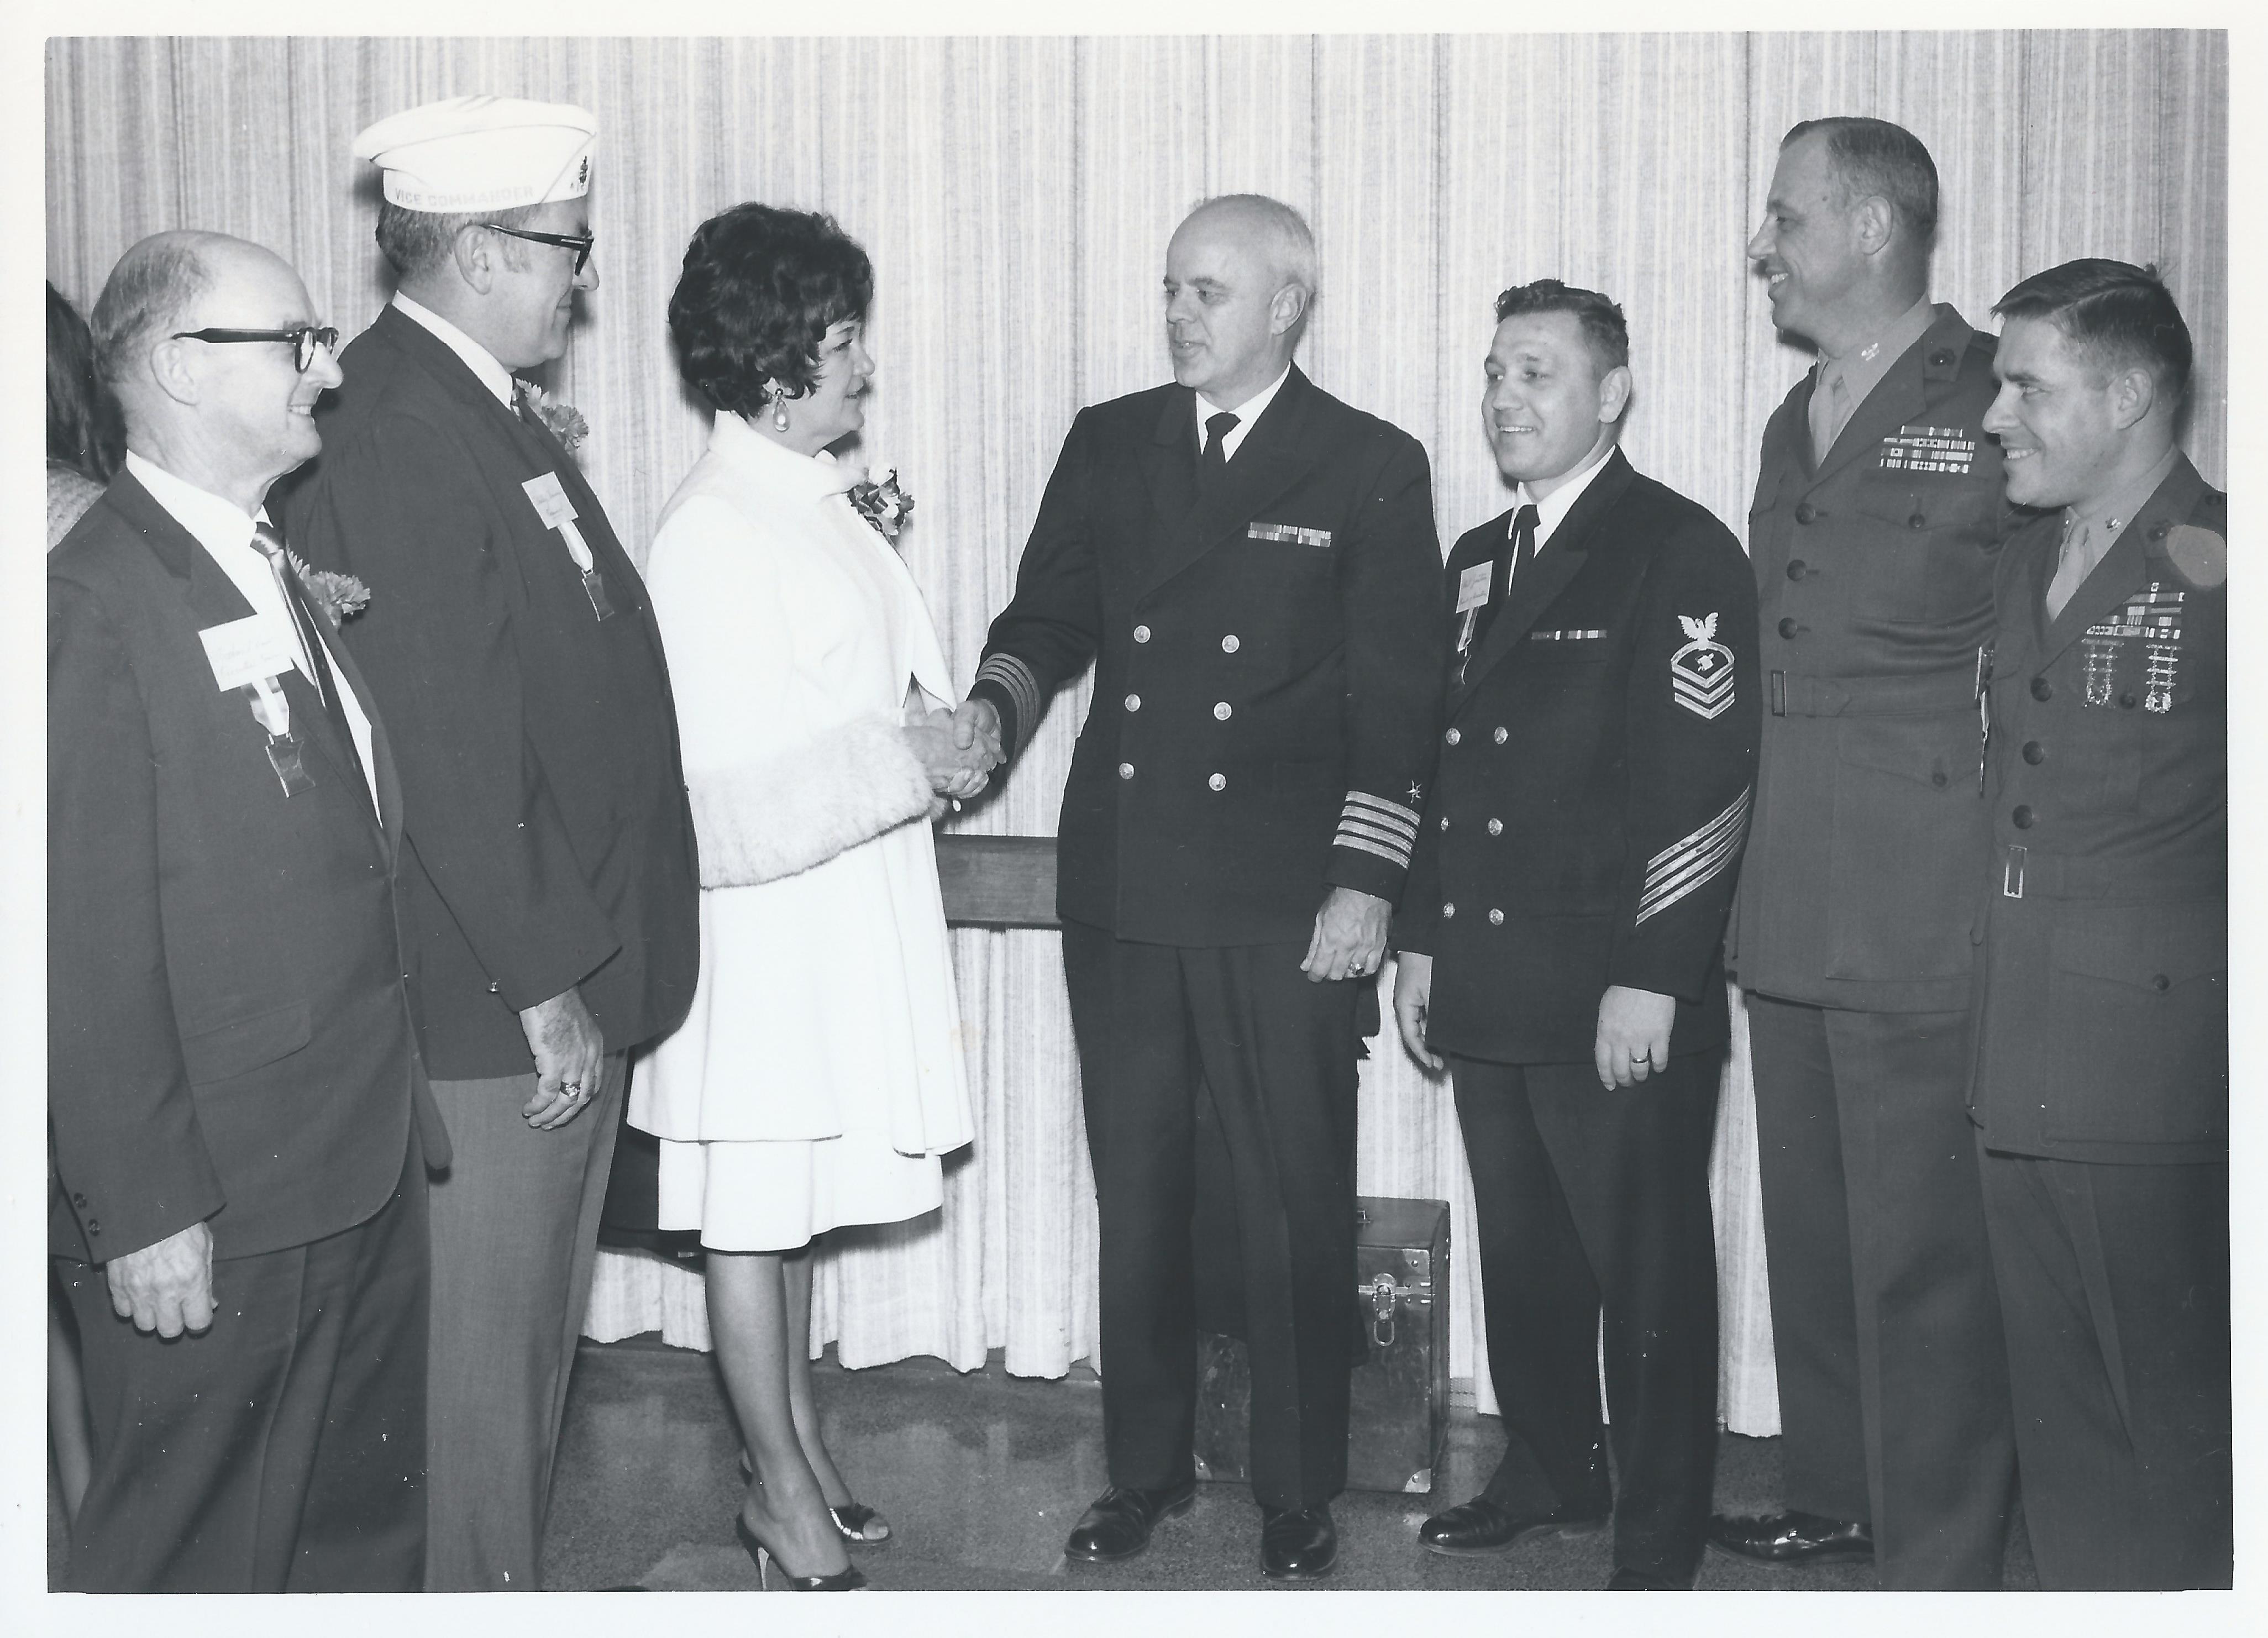 1970 Nov 22 - Opening Day Visitors(10) LtoR: Arthur Dow-BOD member, Phil Ploumen-Treas, Maggie Purdum, Capt B.B.Pererson, Nav&MarTrng, Chief Justin, Maj Brandtner